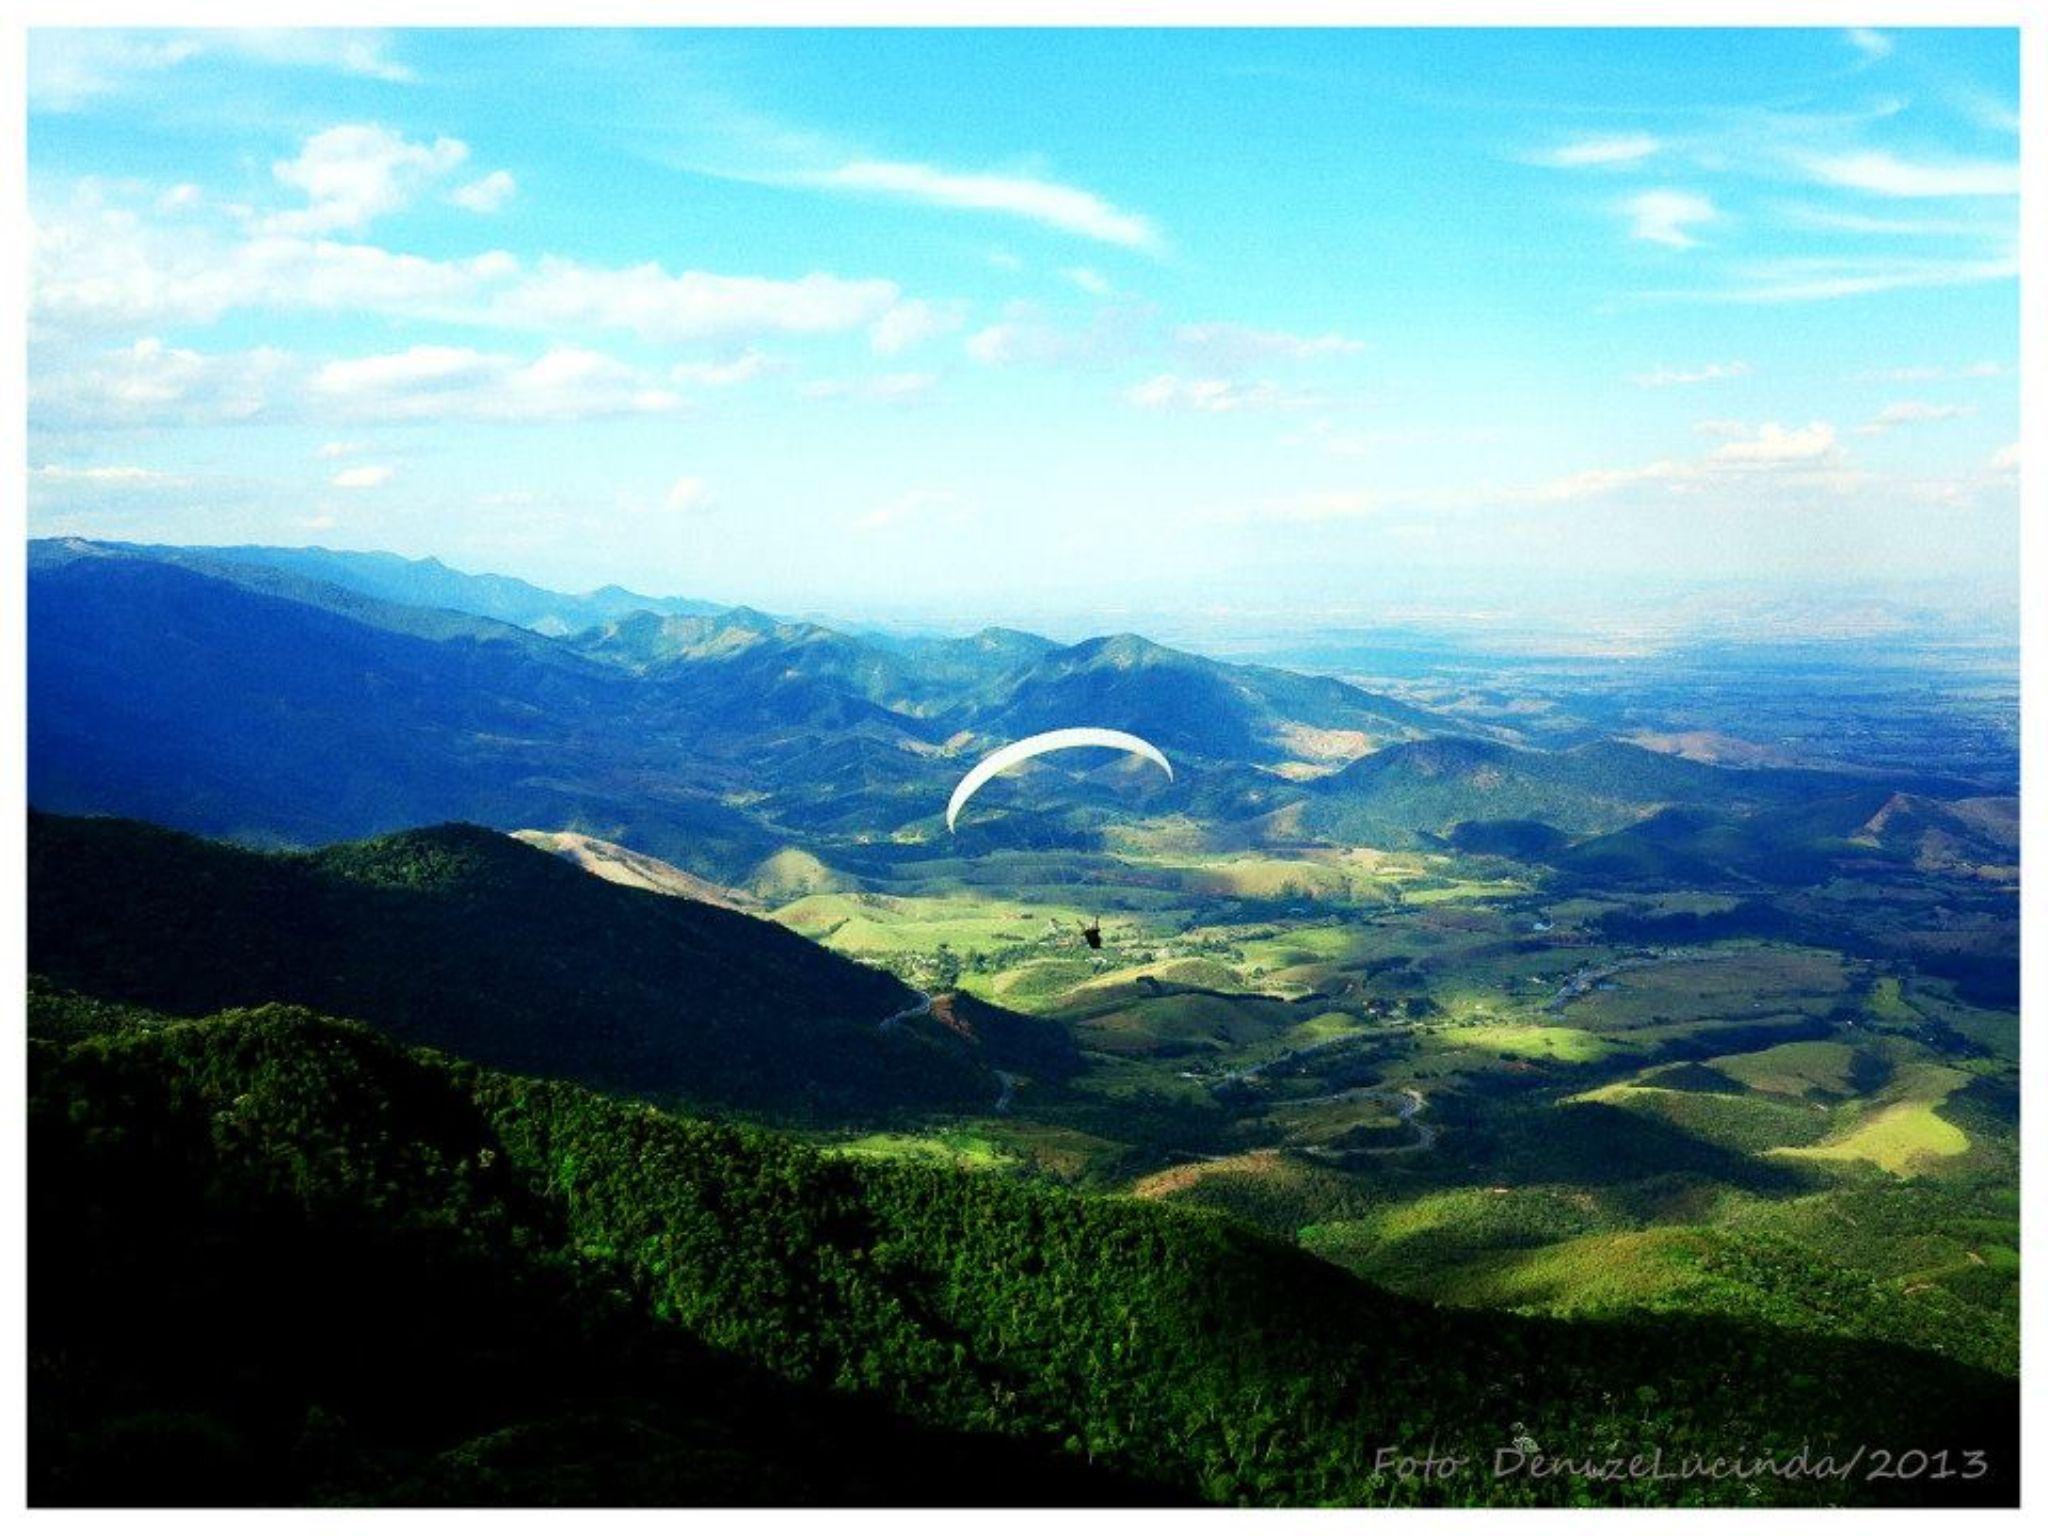 Pico Agudo - Paglider by denizelucinda